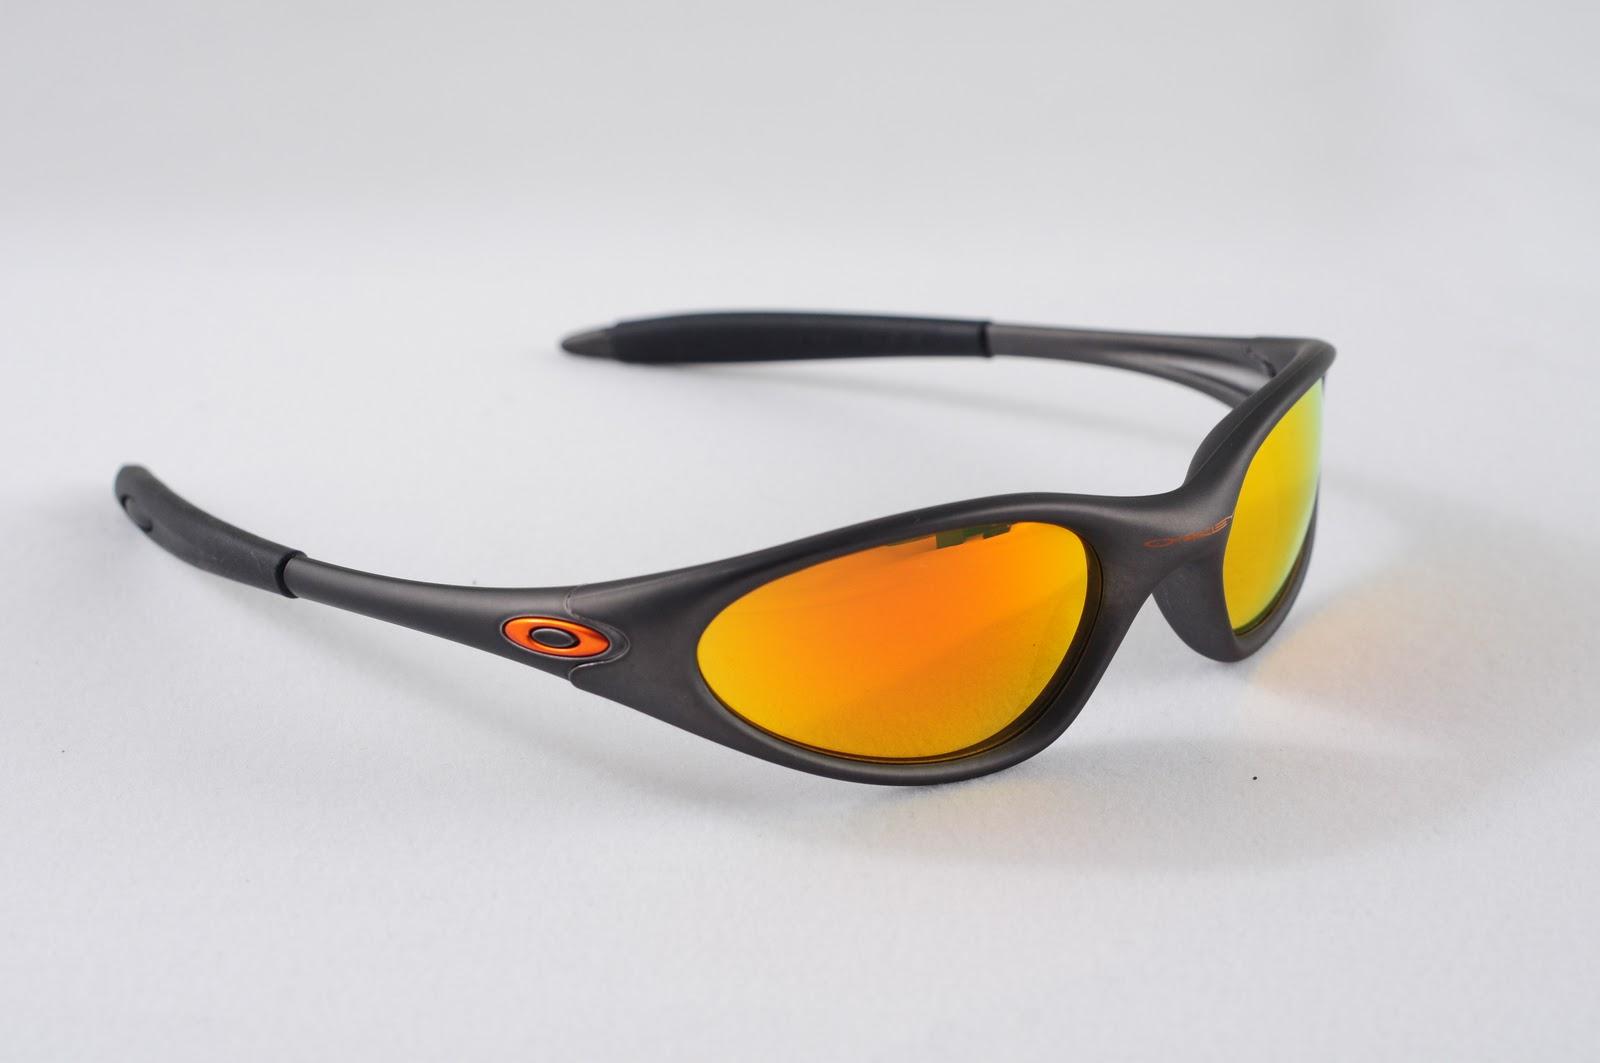 Oakley Minute 1 0 Sunglasses For Sale